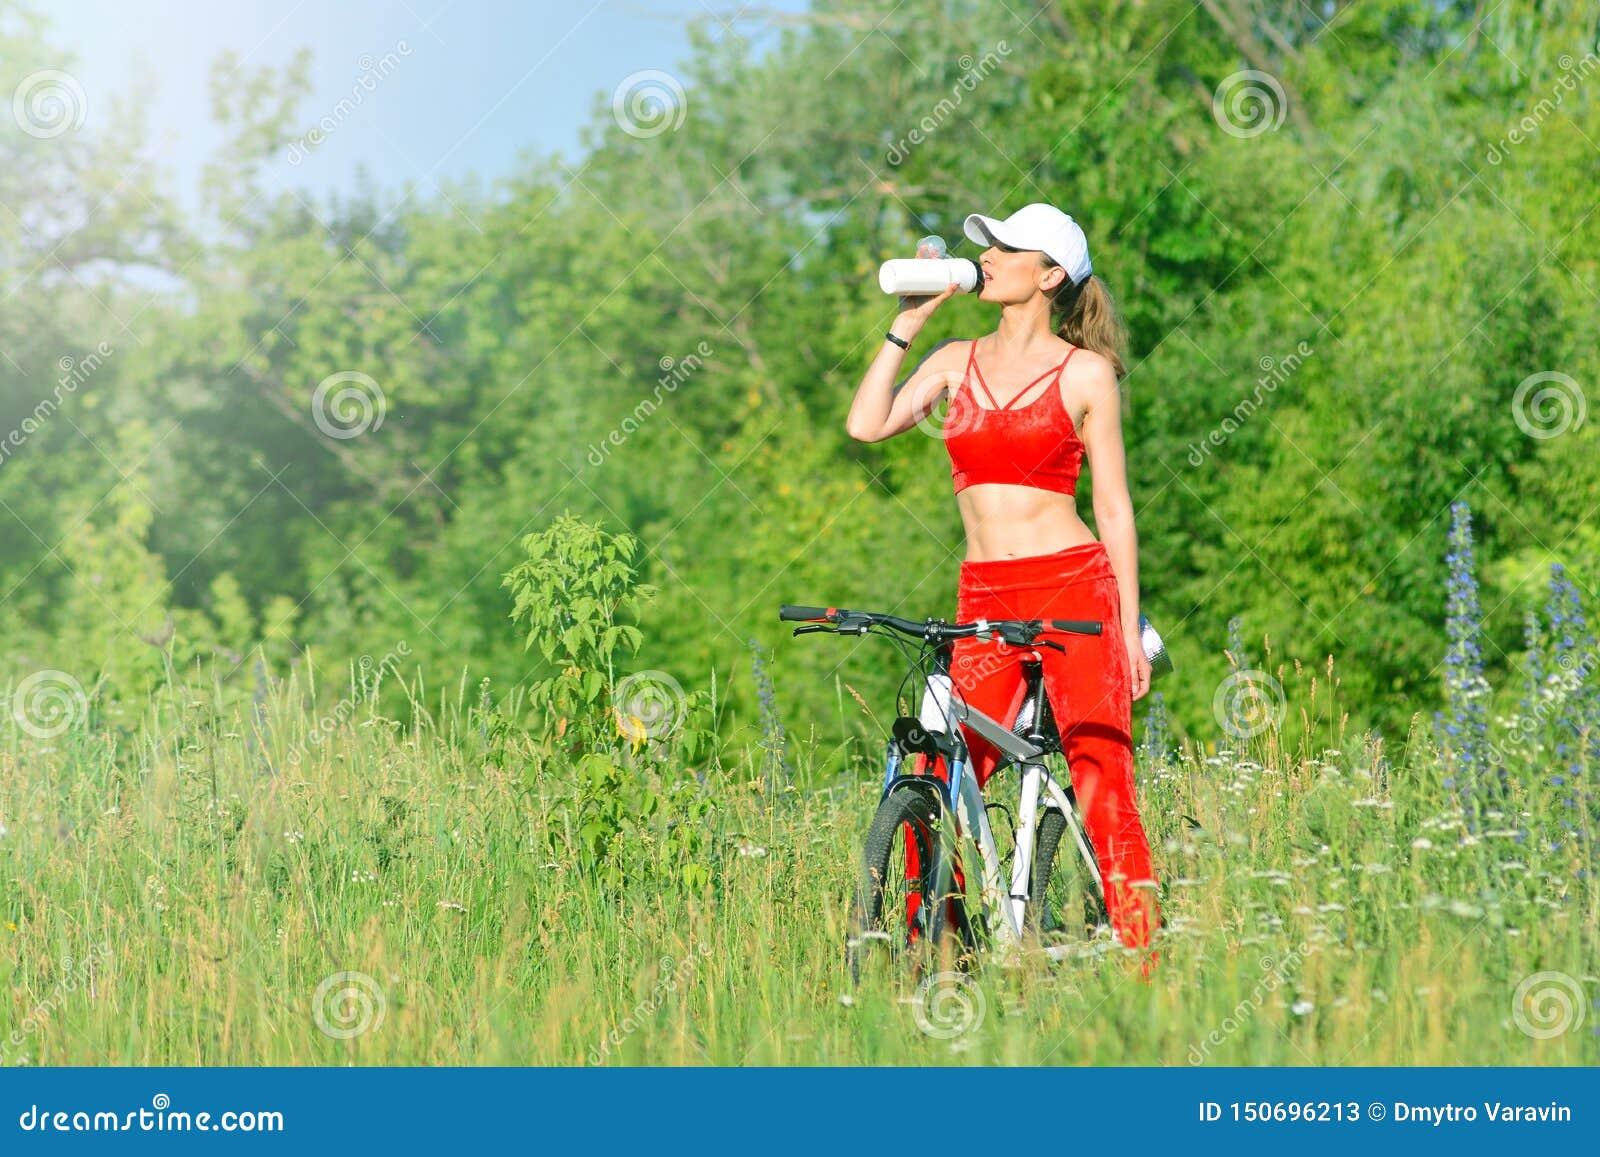 R 健身女孩在自行车附近休息户外并且喝从瓶的水 燃烧的卡路里概念